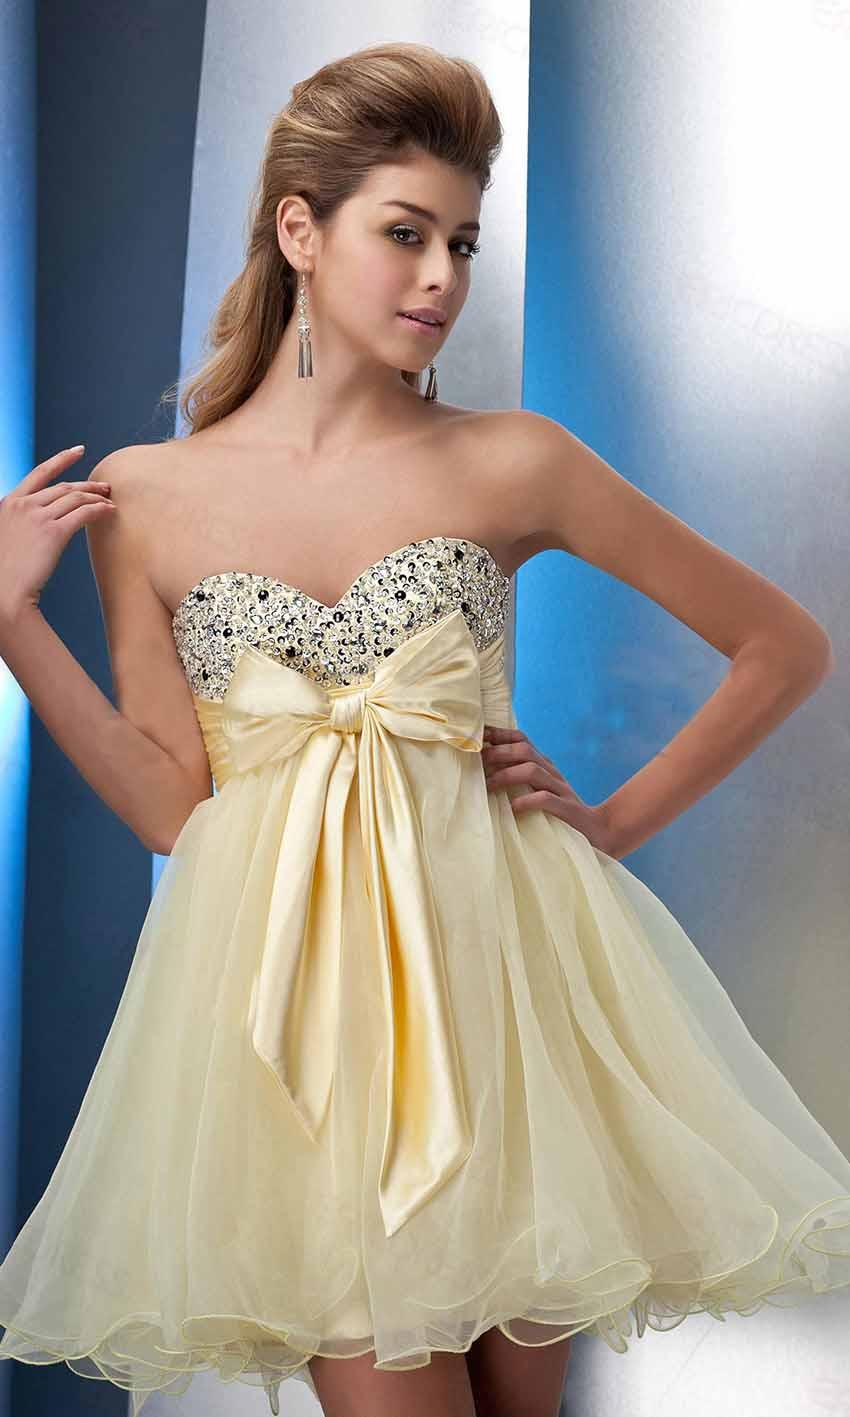 Pastel Yellow Sequin Empire Bowknot Short Prom Gown KSP392 [KSP392 ...